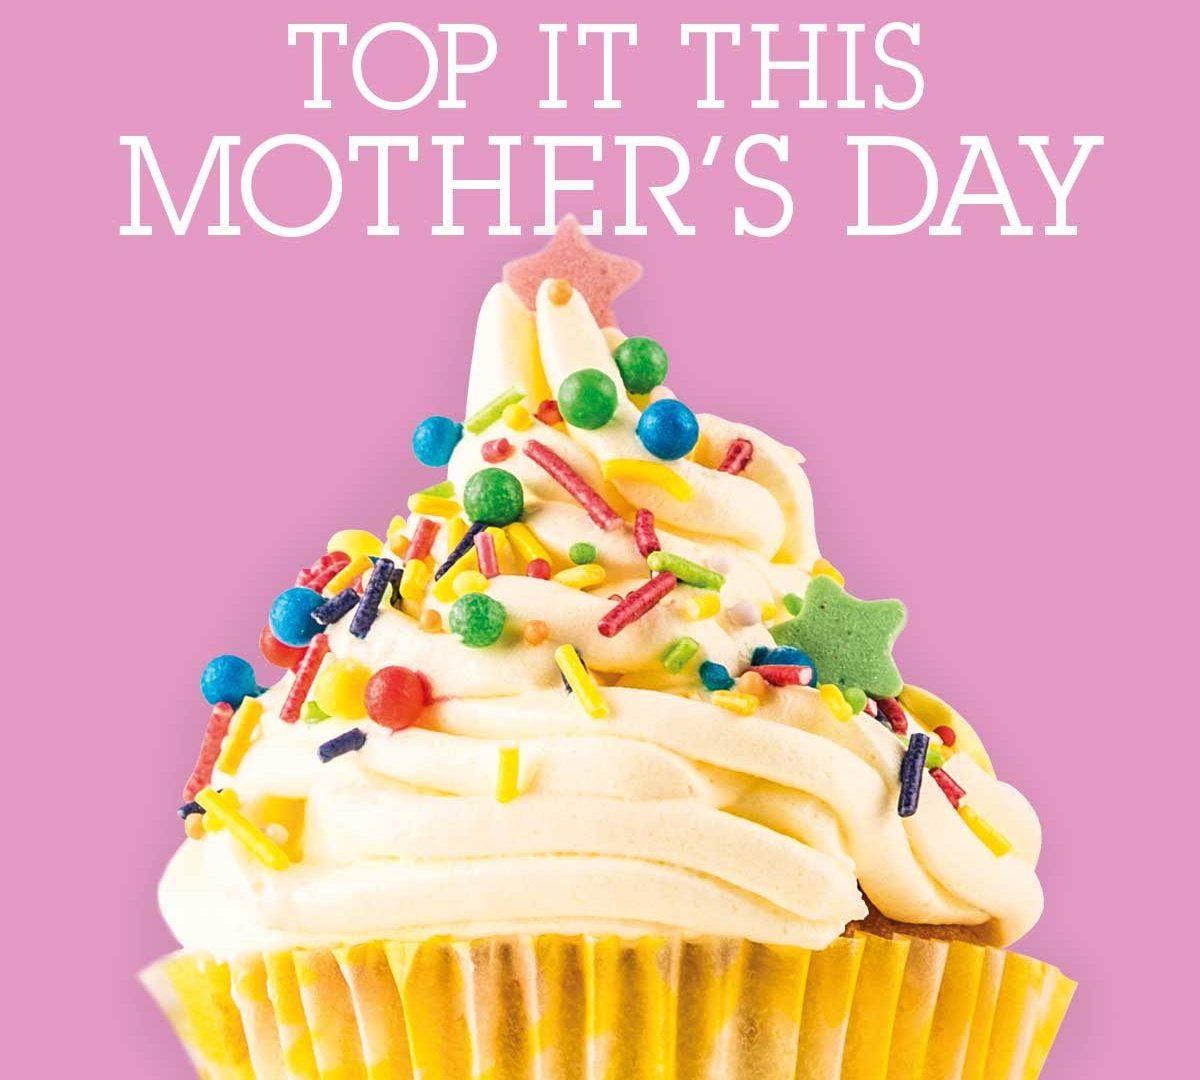 6120 Citywest Mother's Day FBpromo 1200x1200 OK